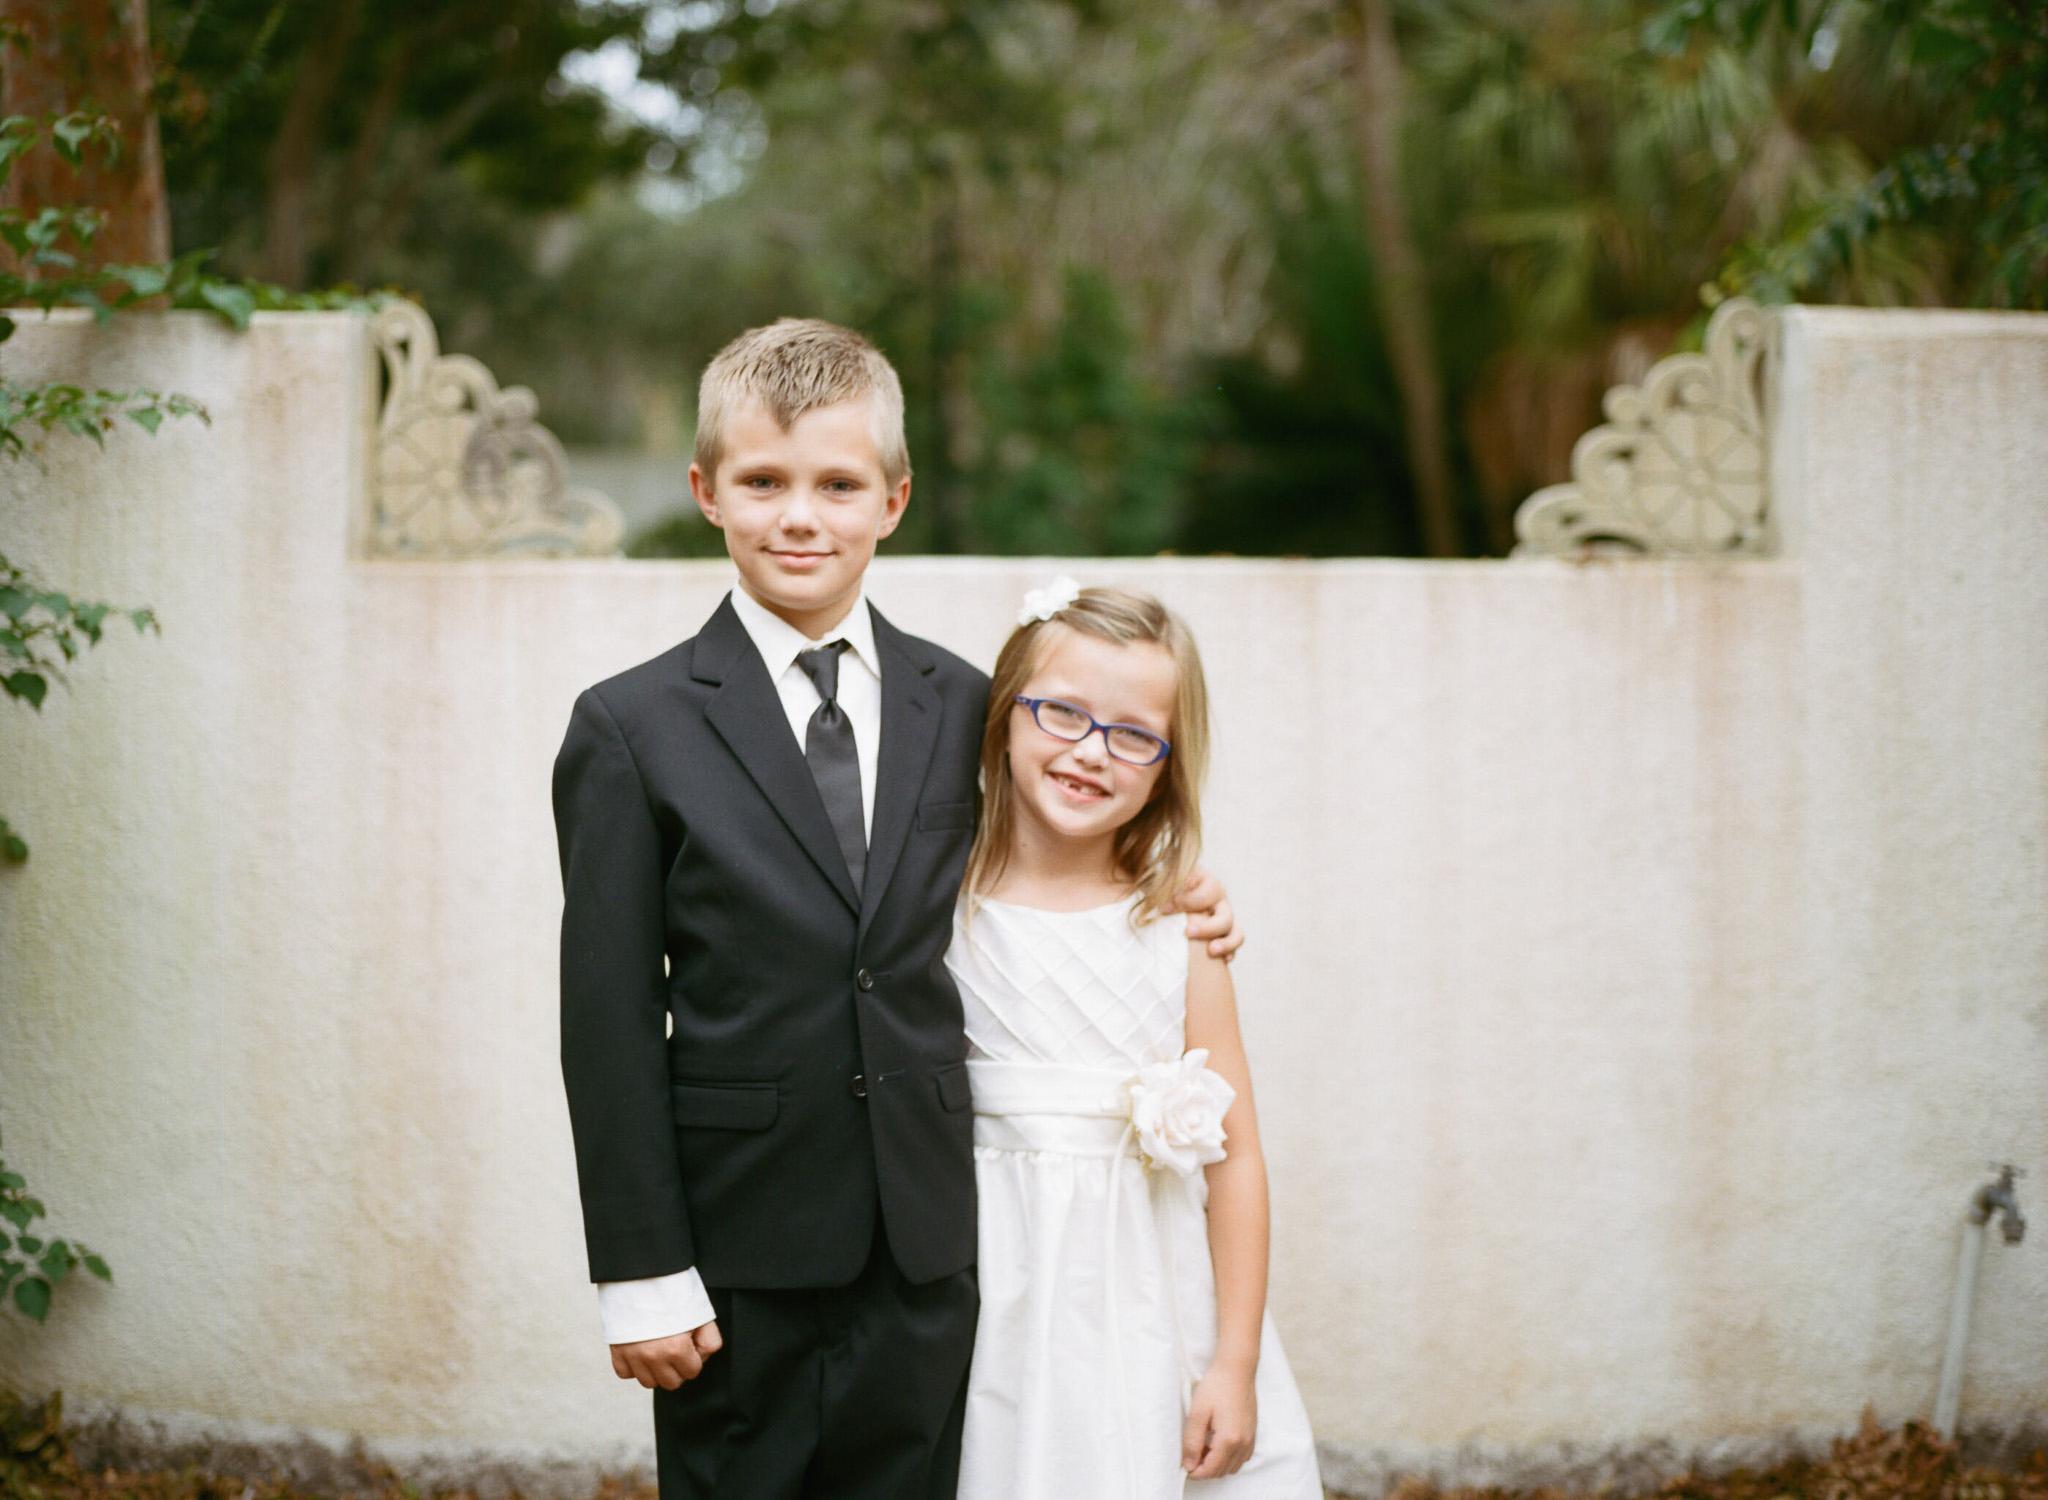 Christina-Matt-Maitland-Art-Center-Wedding31.JPG